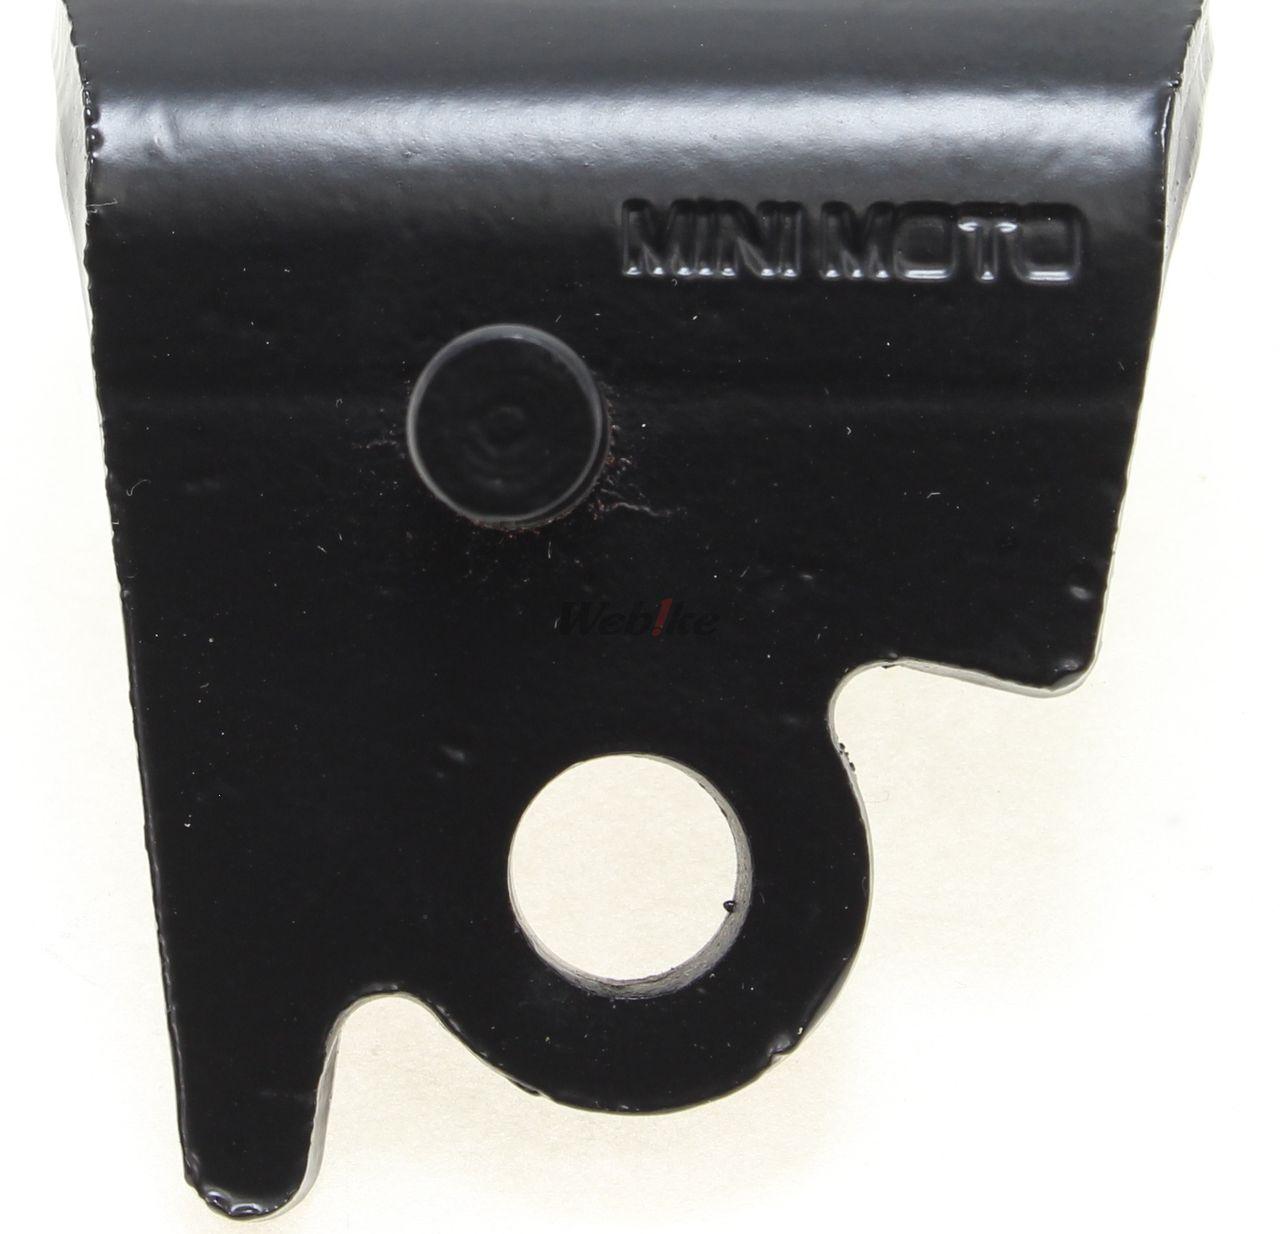 【MINIMOTO】Monkey腳踏後移用Step-less 安裝支架 - 「Webike-摩托百貨」